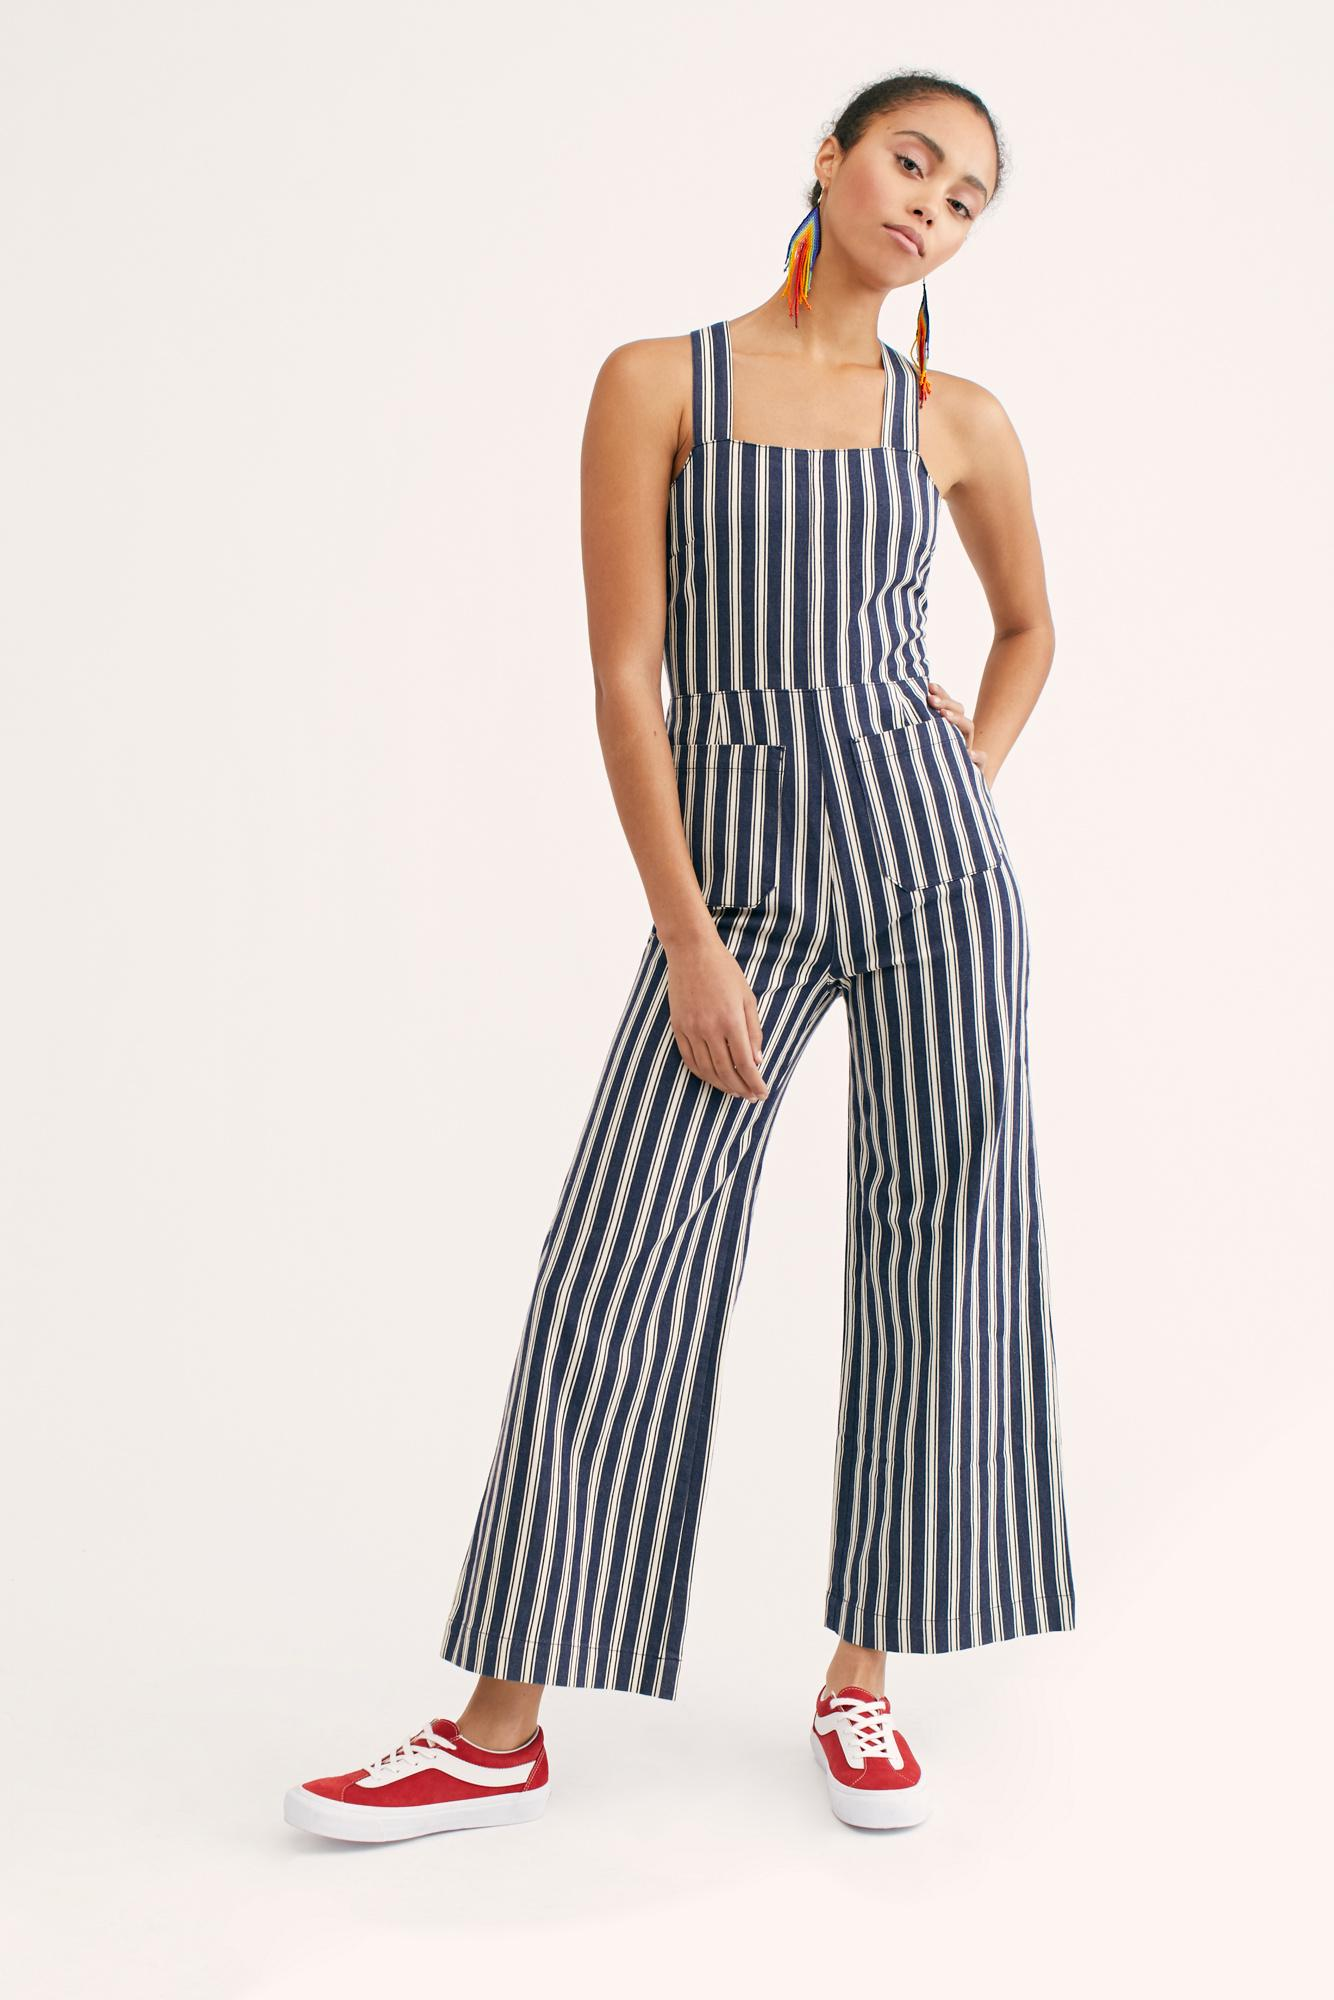 ed562817c2de Free People - Blue Sailor Stripe Jumpsuit - Lyst. View fullscreen